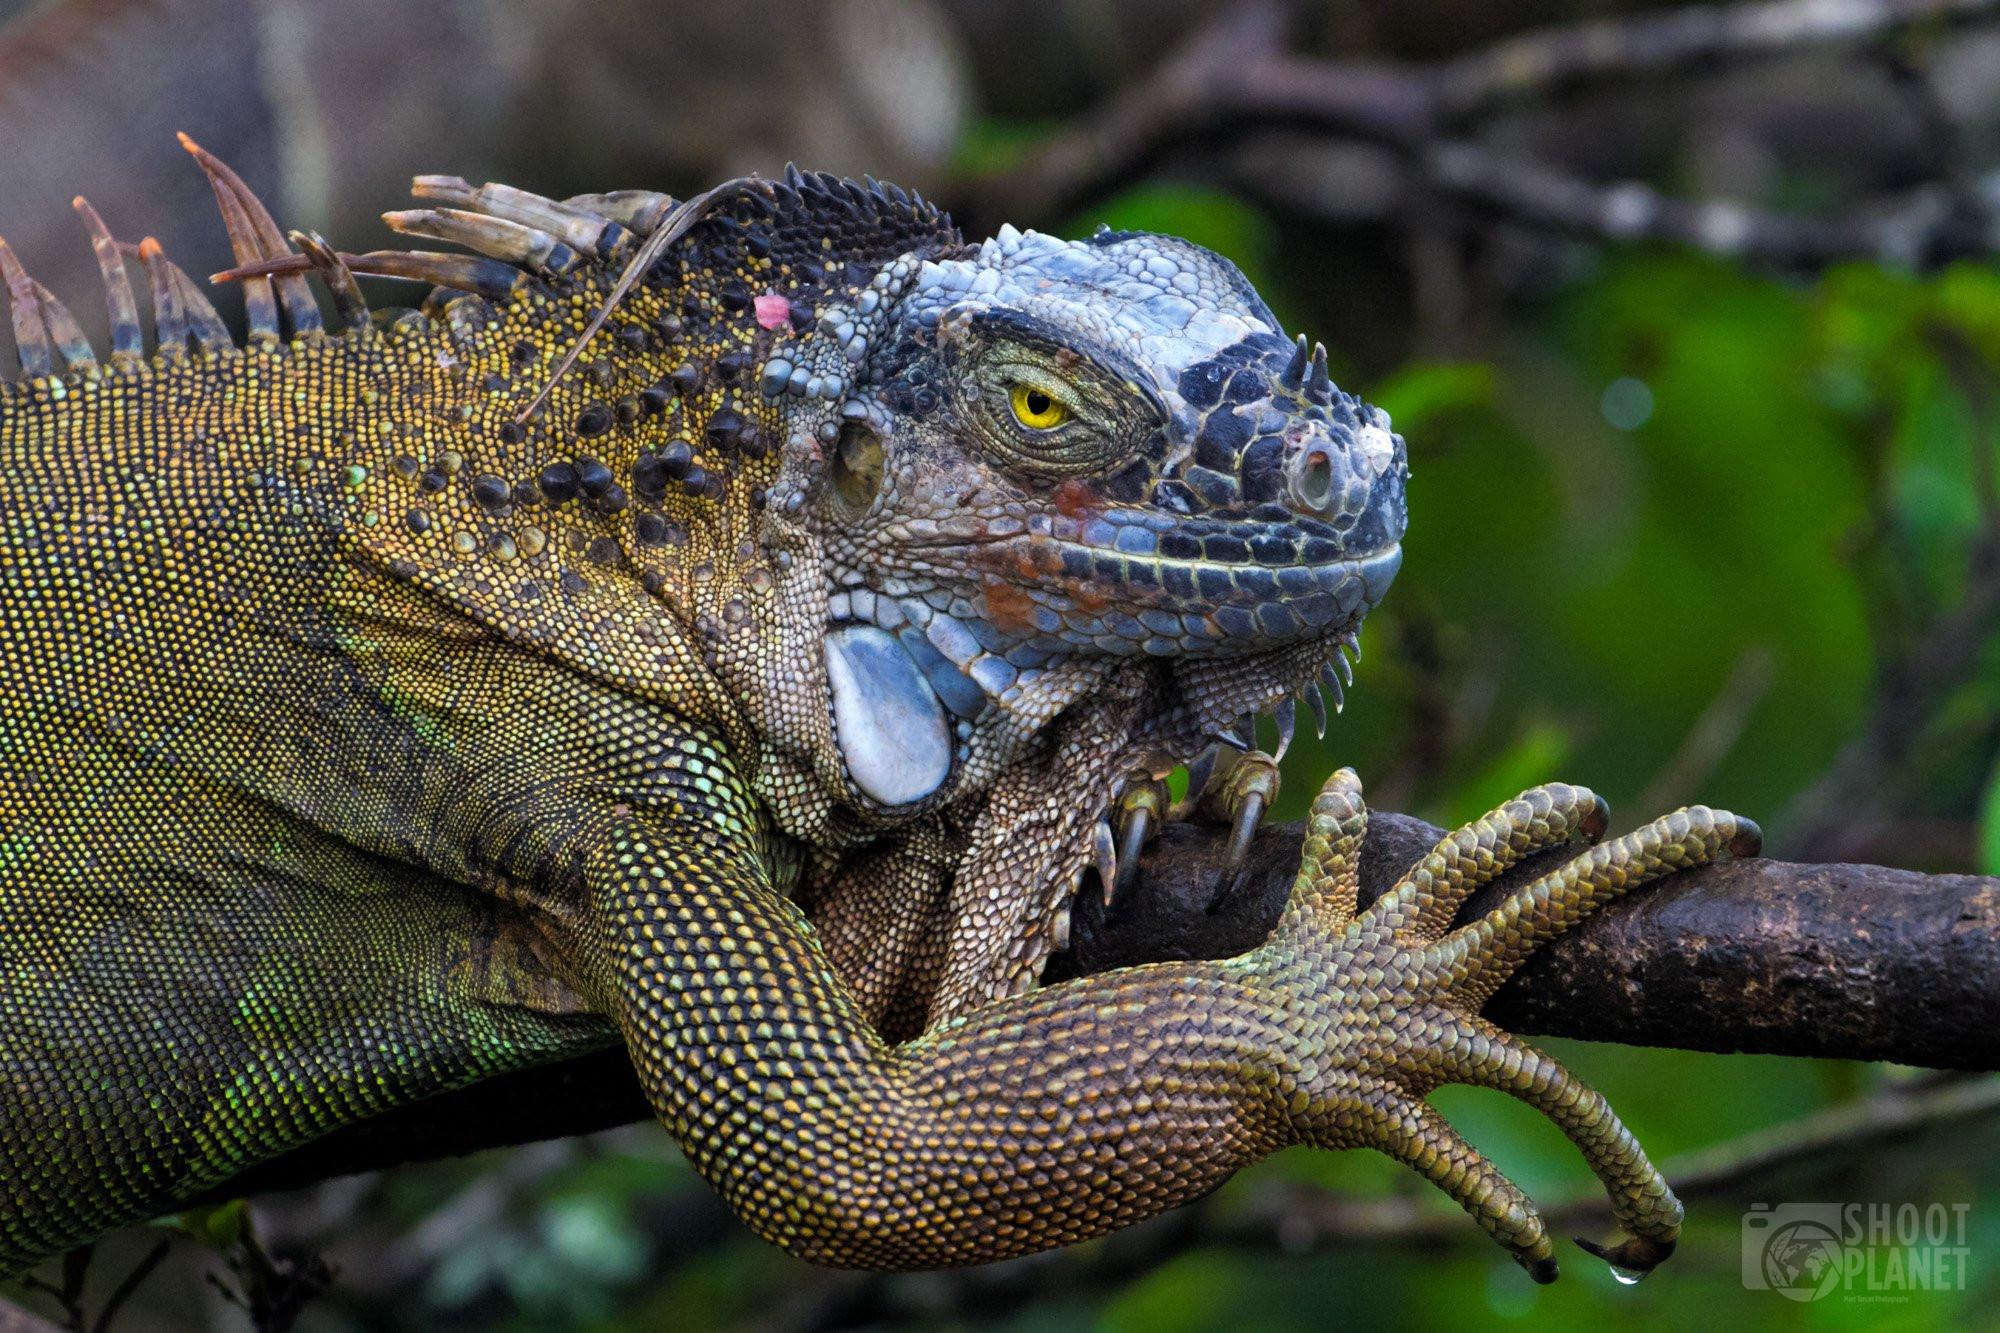 Green iguana head and claw, Costa Rica